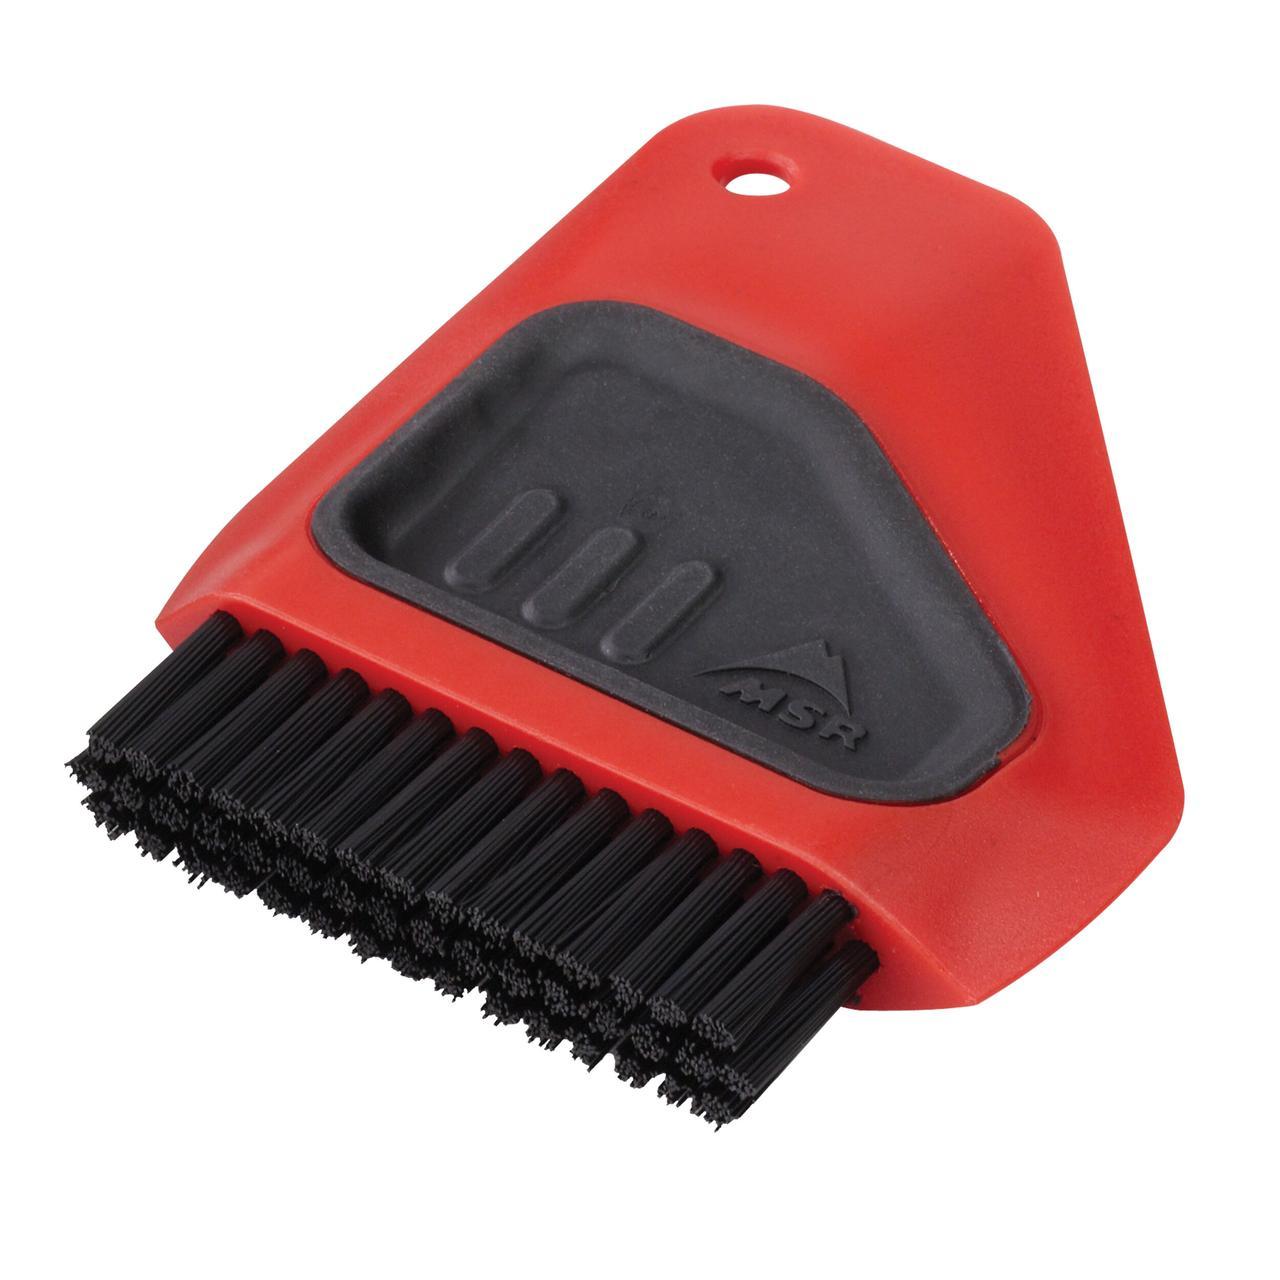 Аксессуар MSR Alpine Dish Brush - Scraper